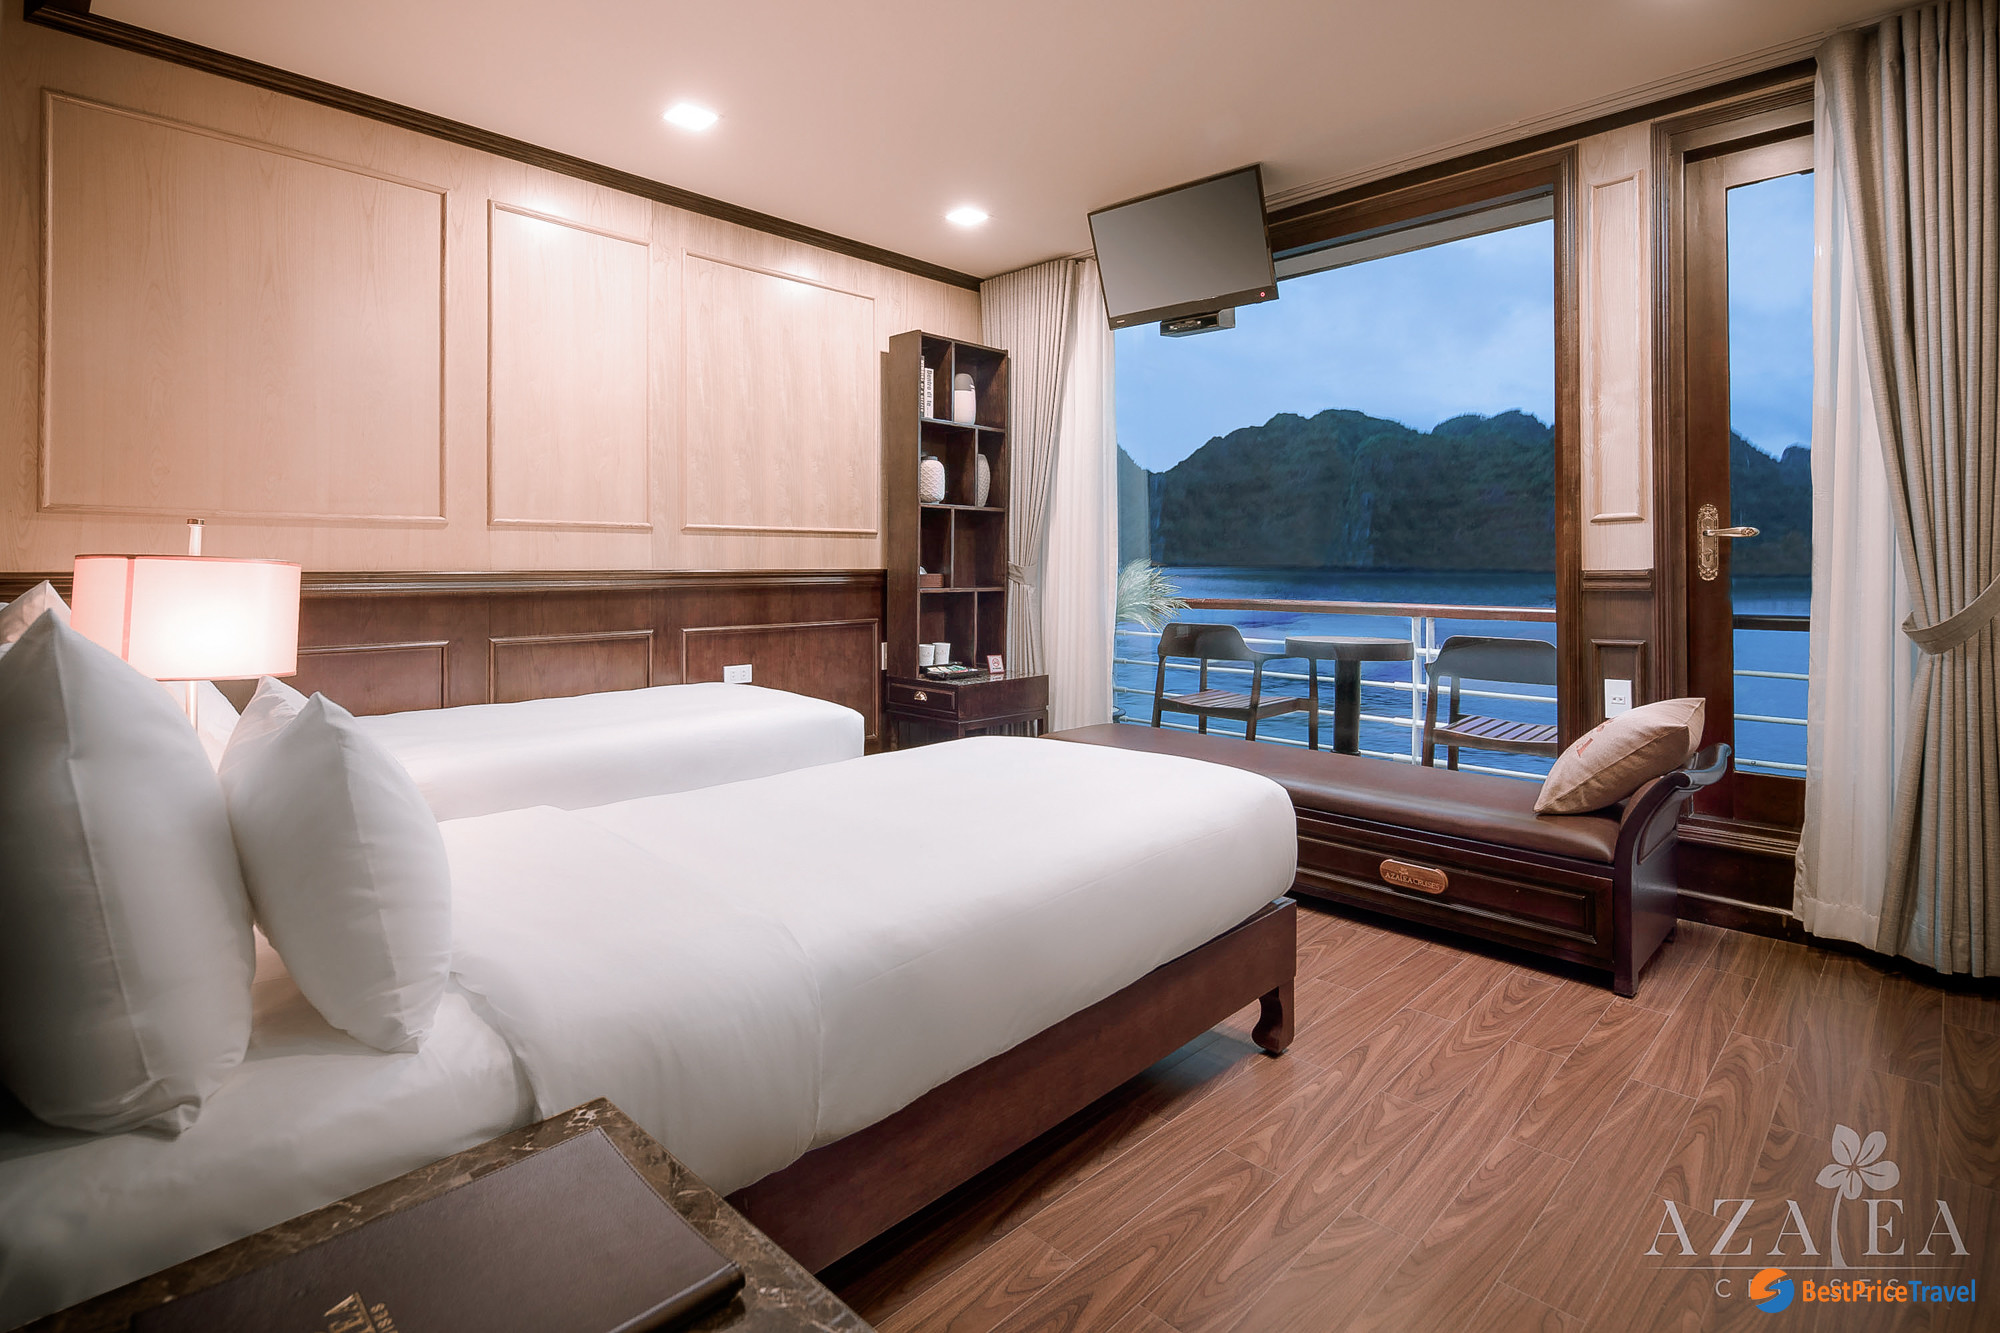 Deluxe Balcony Cabin on Azalea Cruise